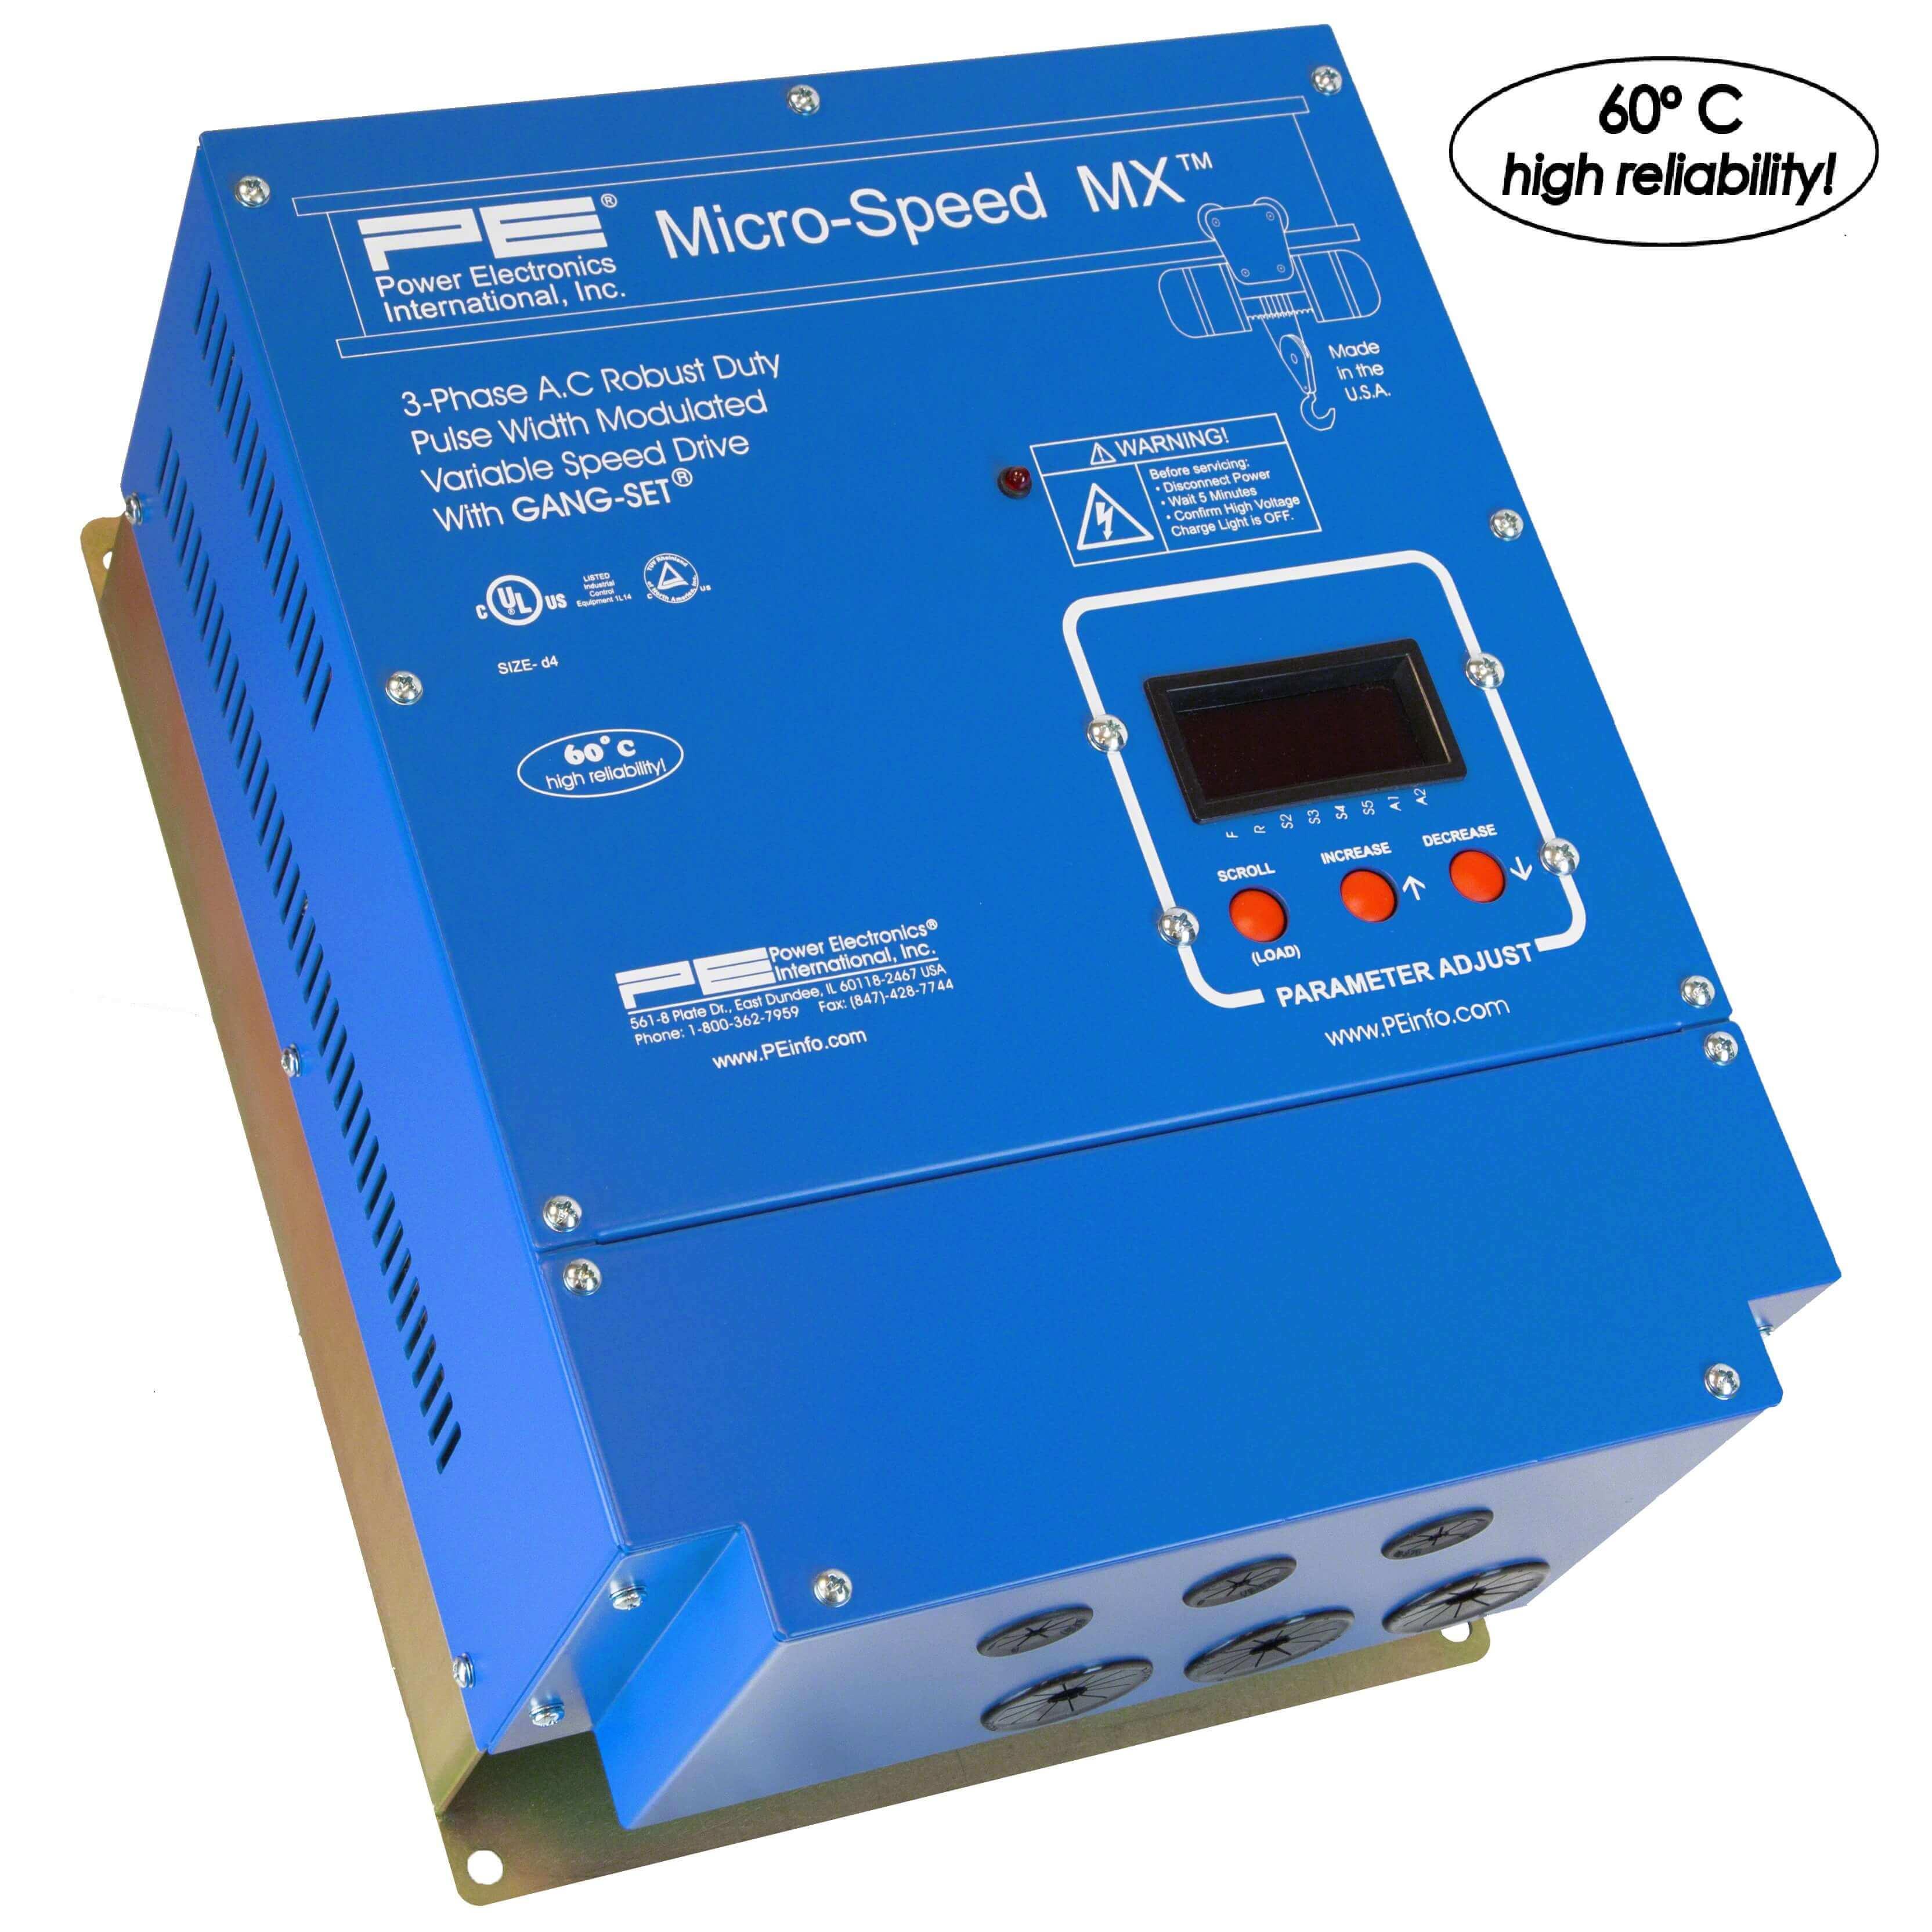 Micro-speed MX (1-600HP) (Power Elec.)